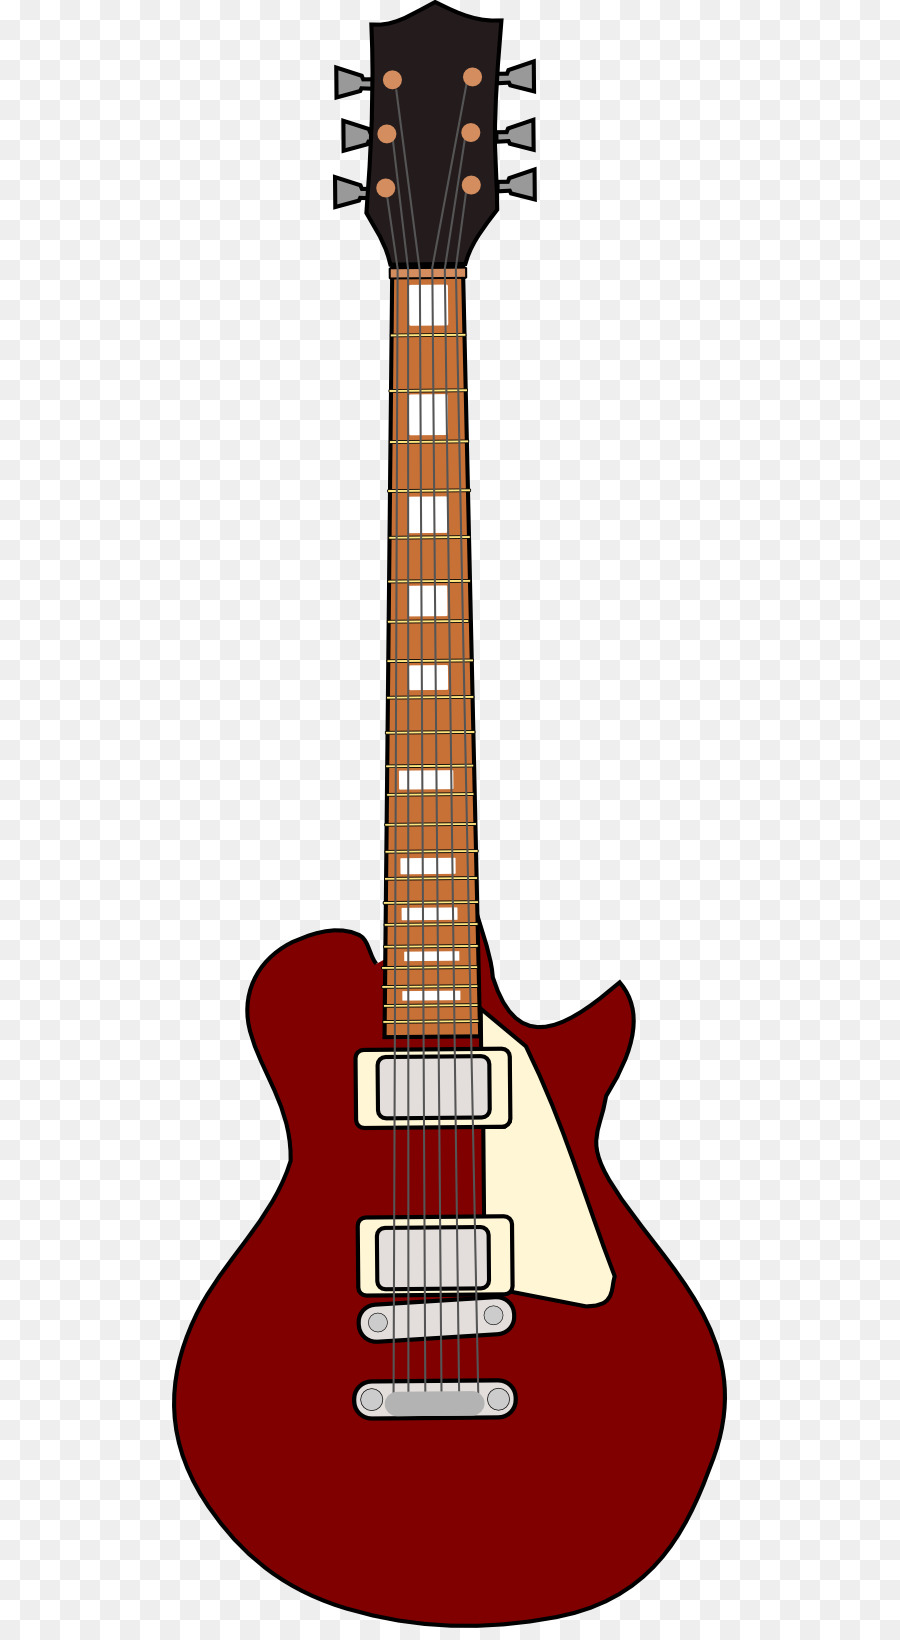 Gibson Les Paul Studio Guitar Clip art.